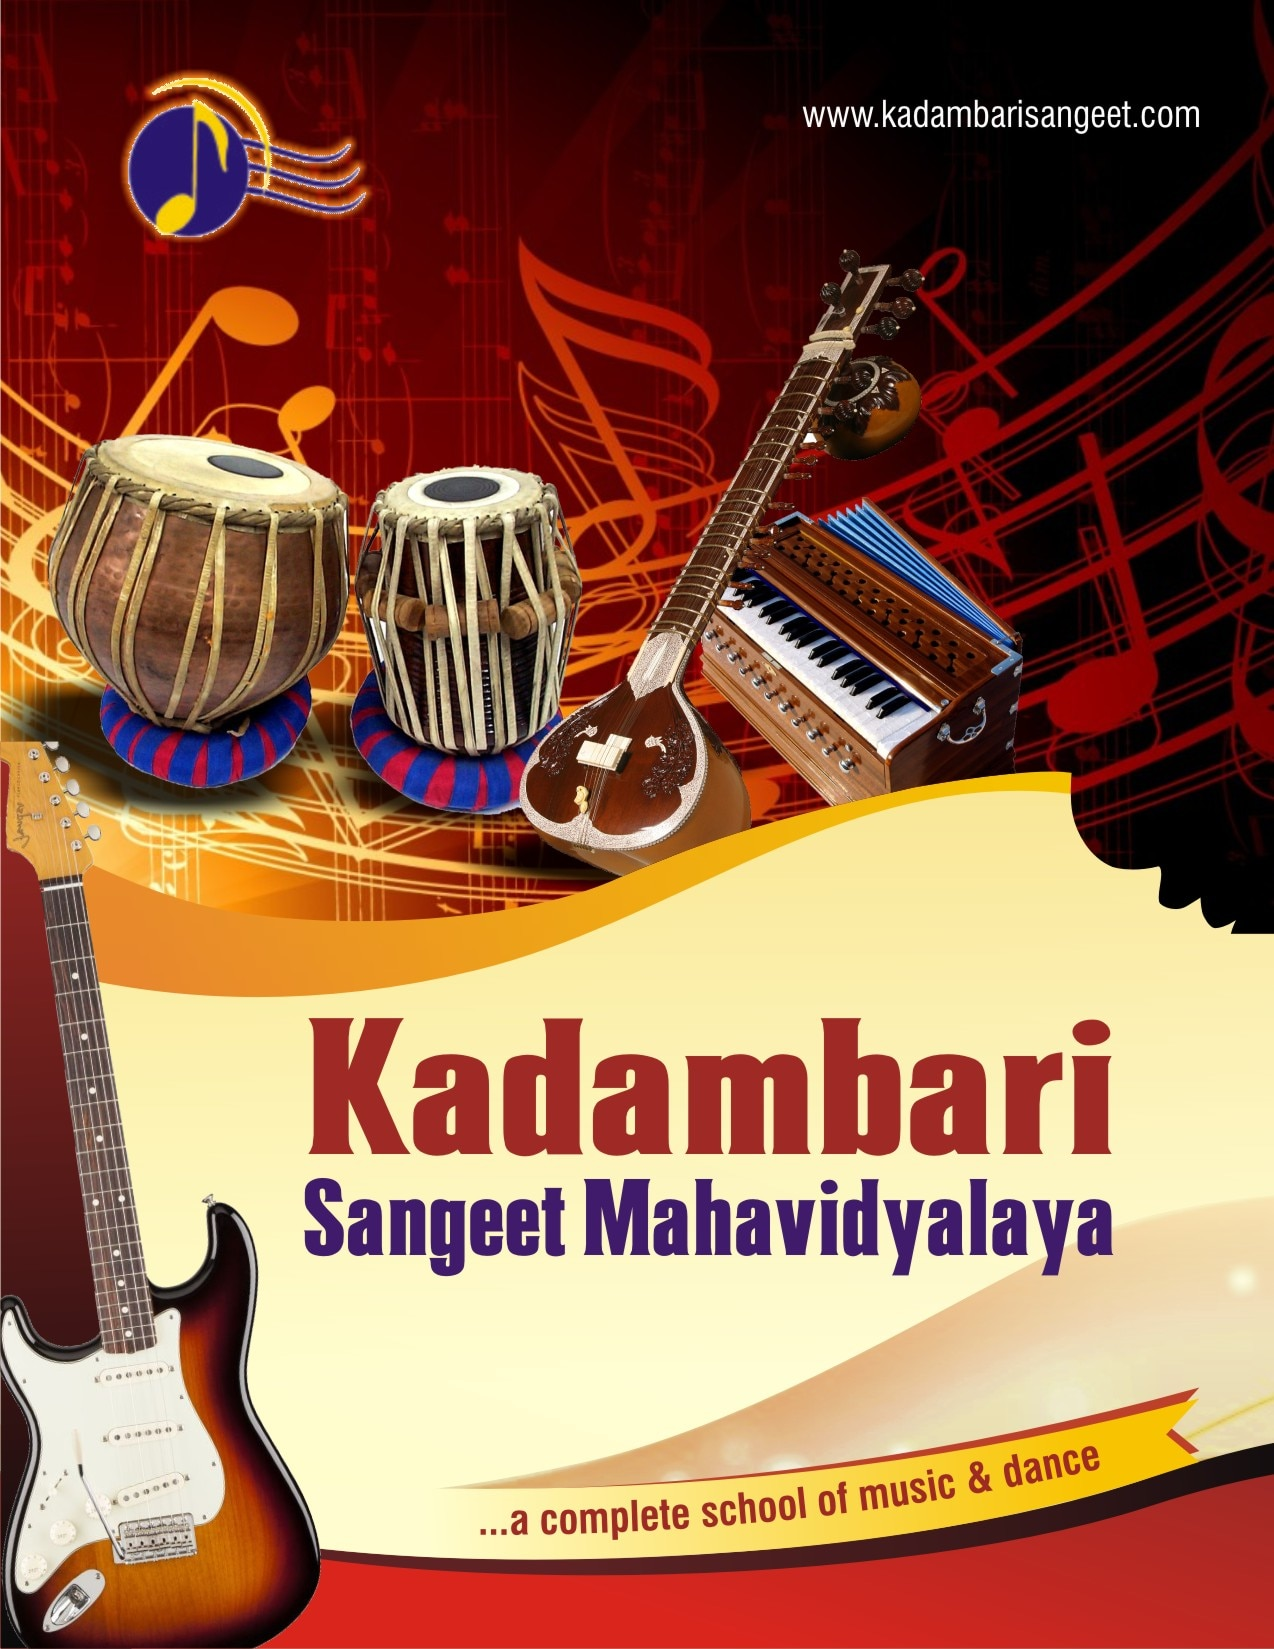 Logo of Kadambari Sangeet Mahavidyalaya